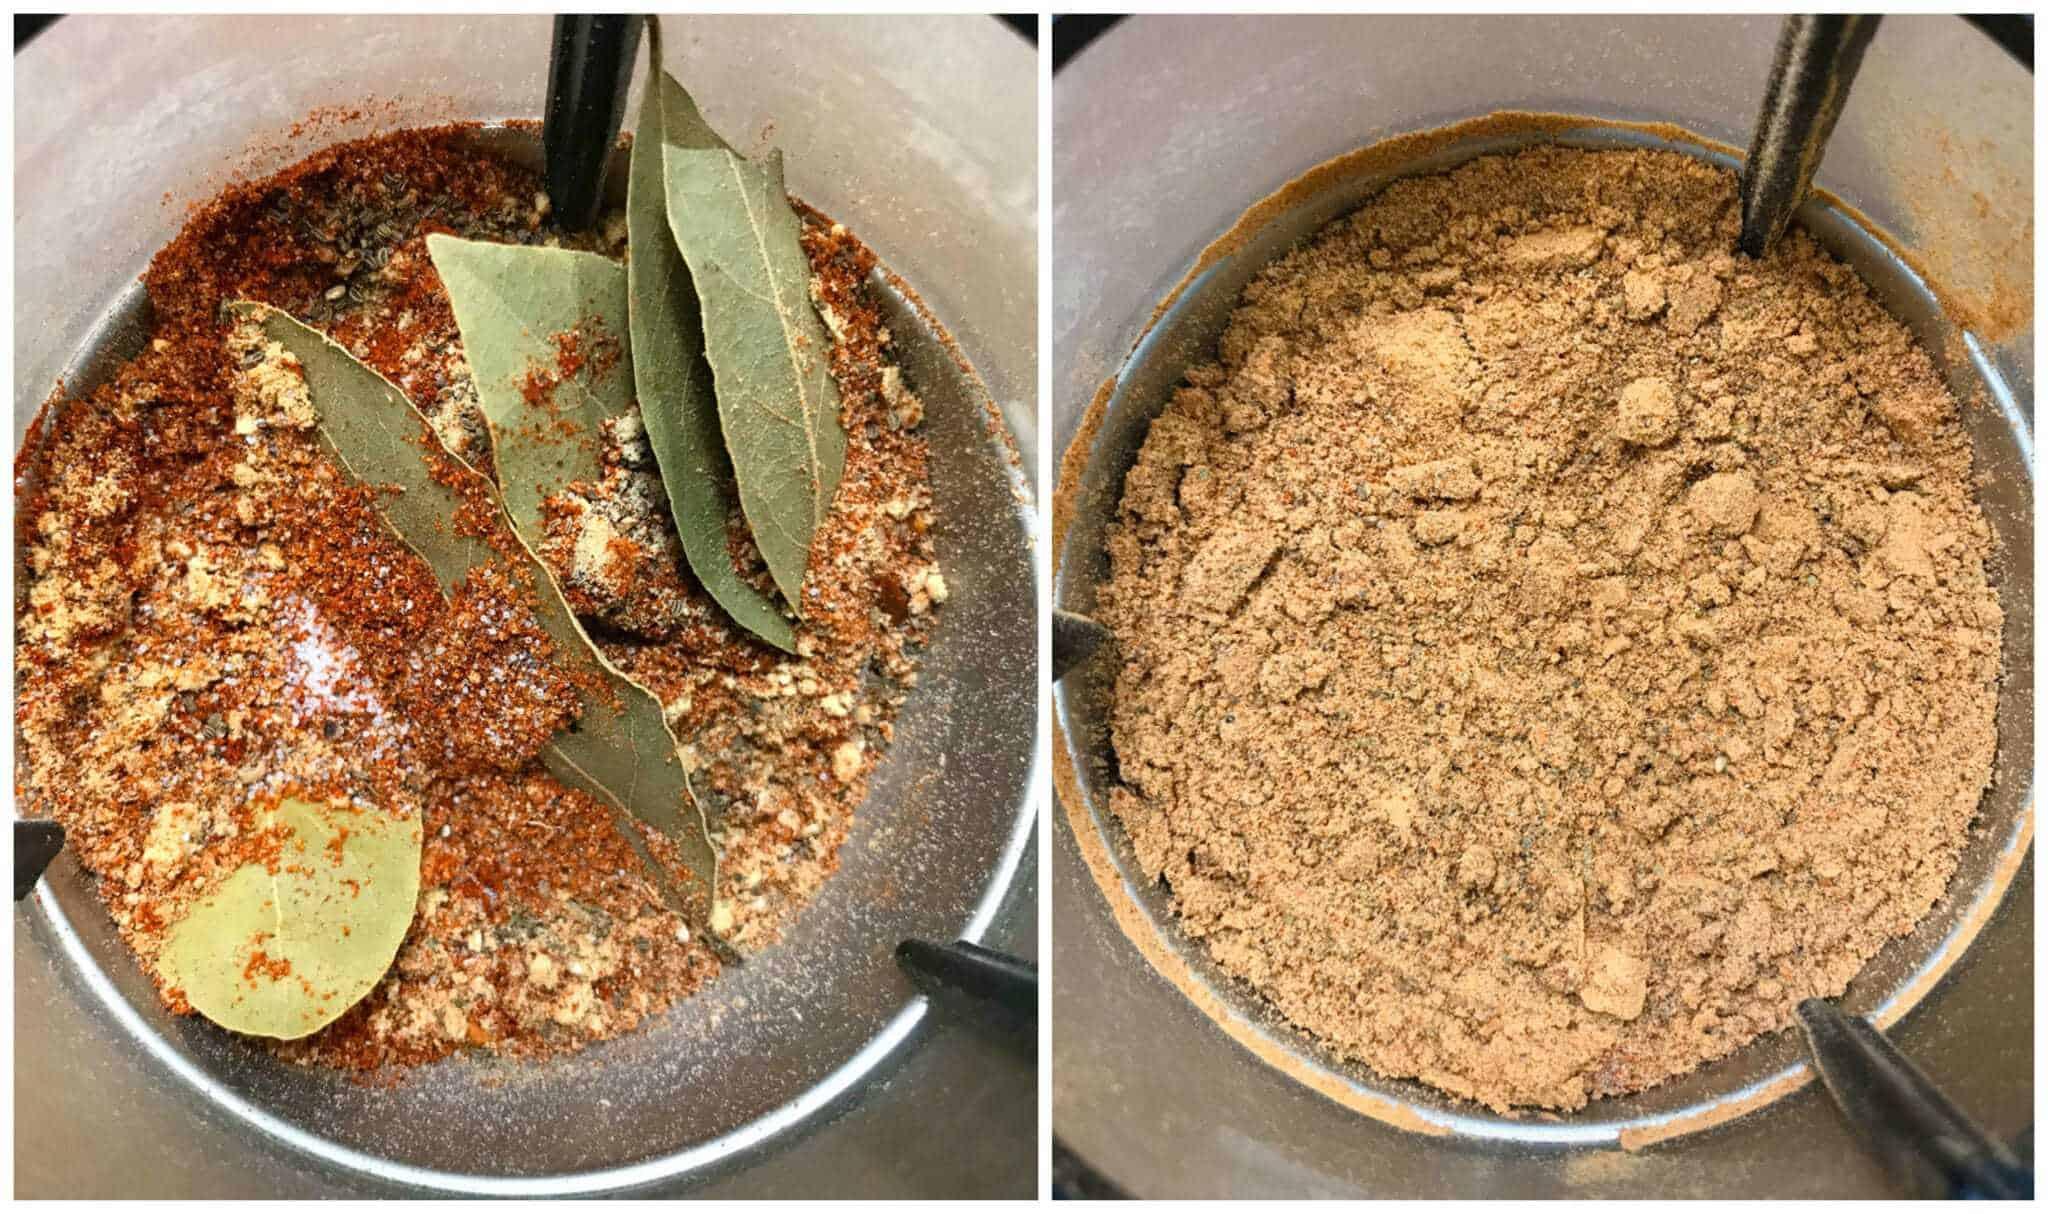 grinding ingredients to powder